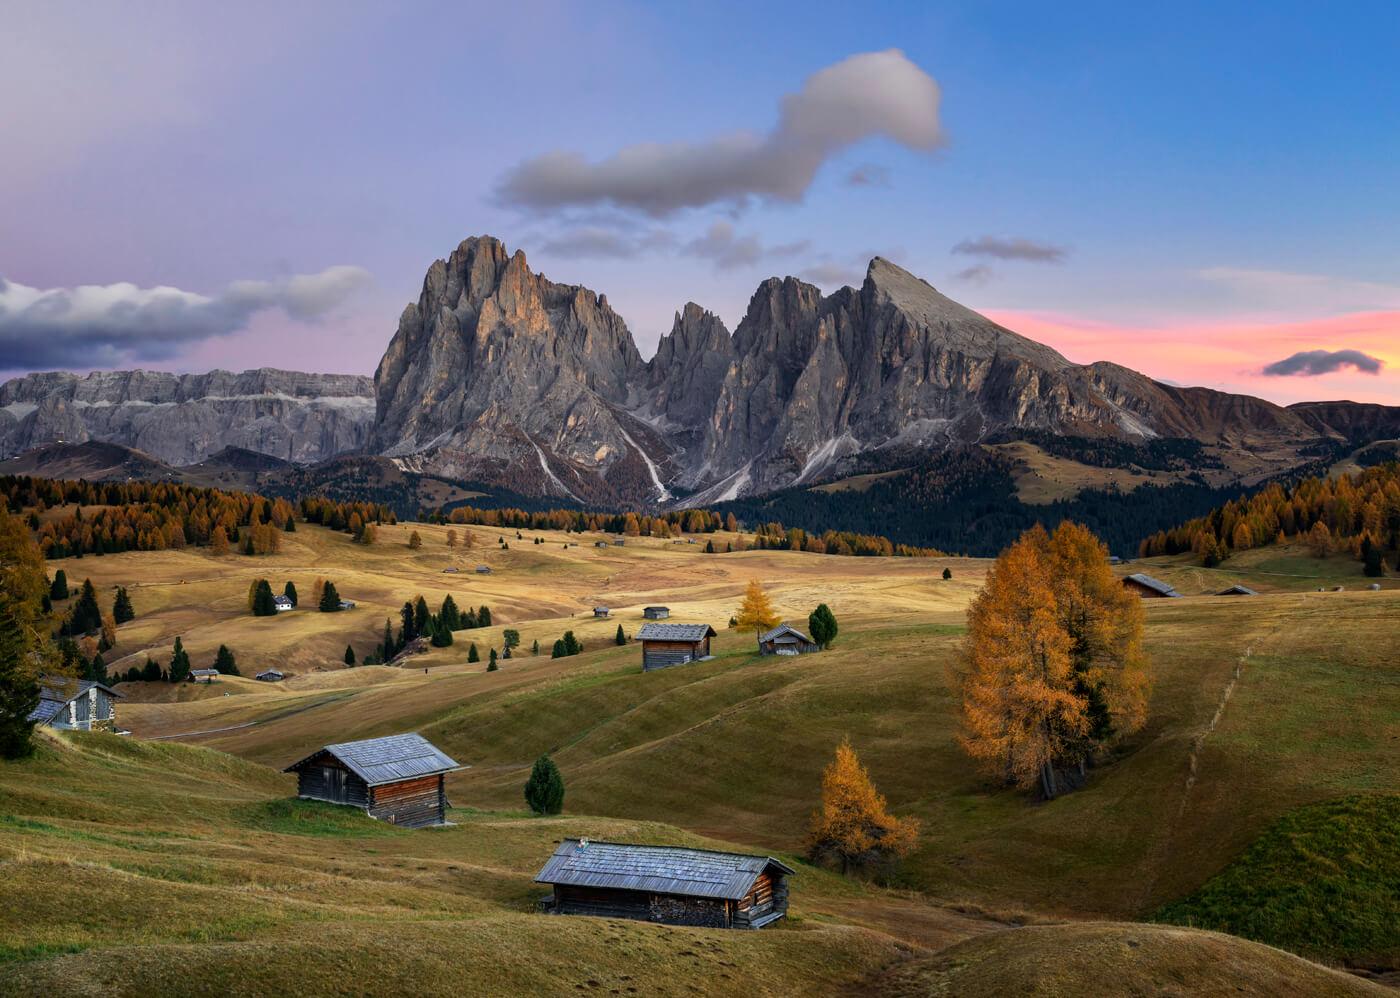 Sunset, Alpe di Siusi, Dolomites